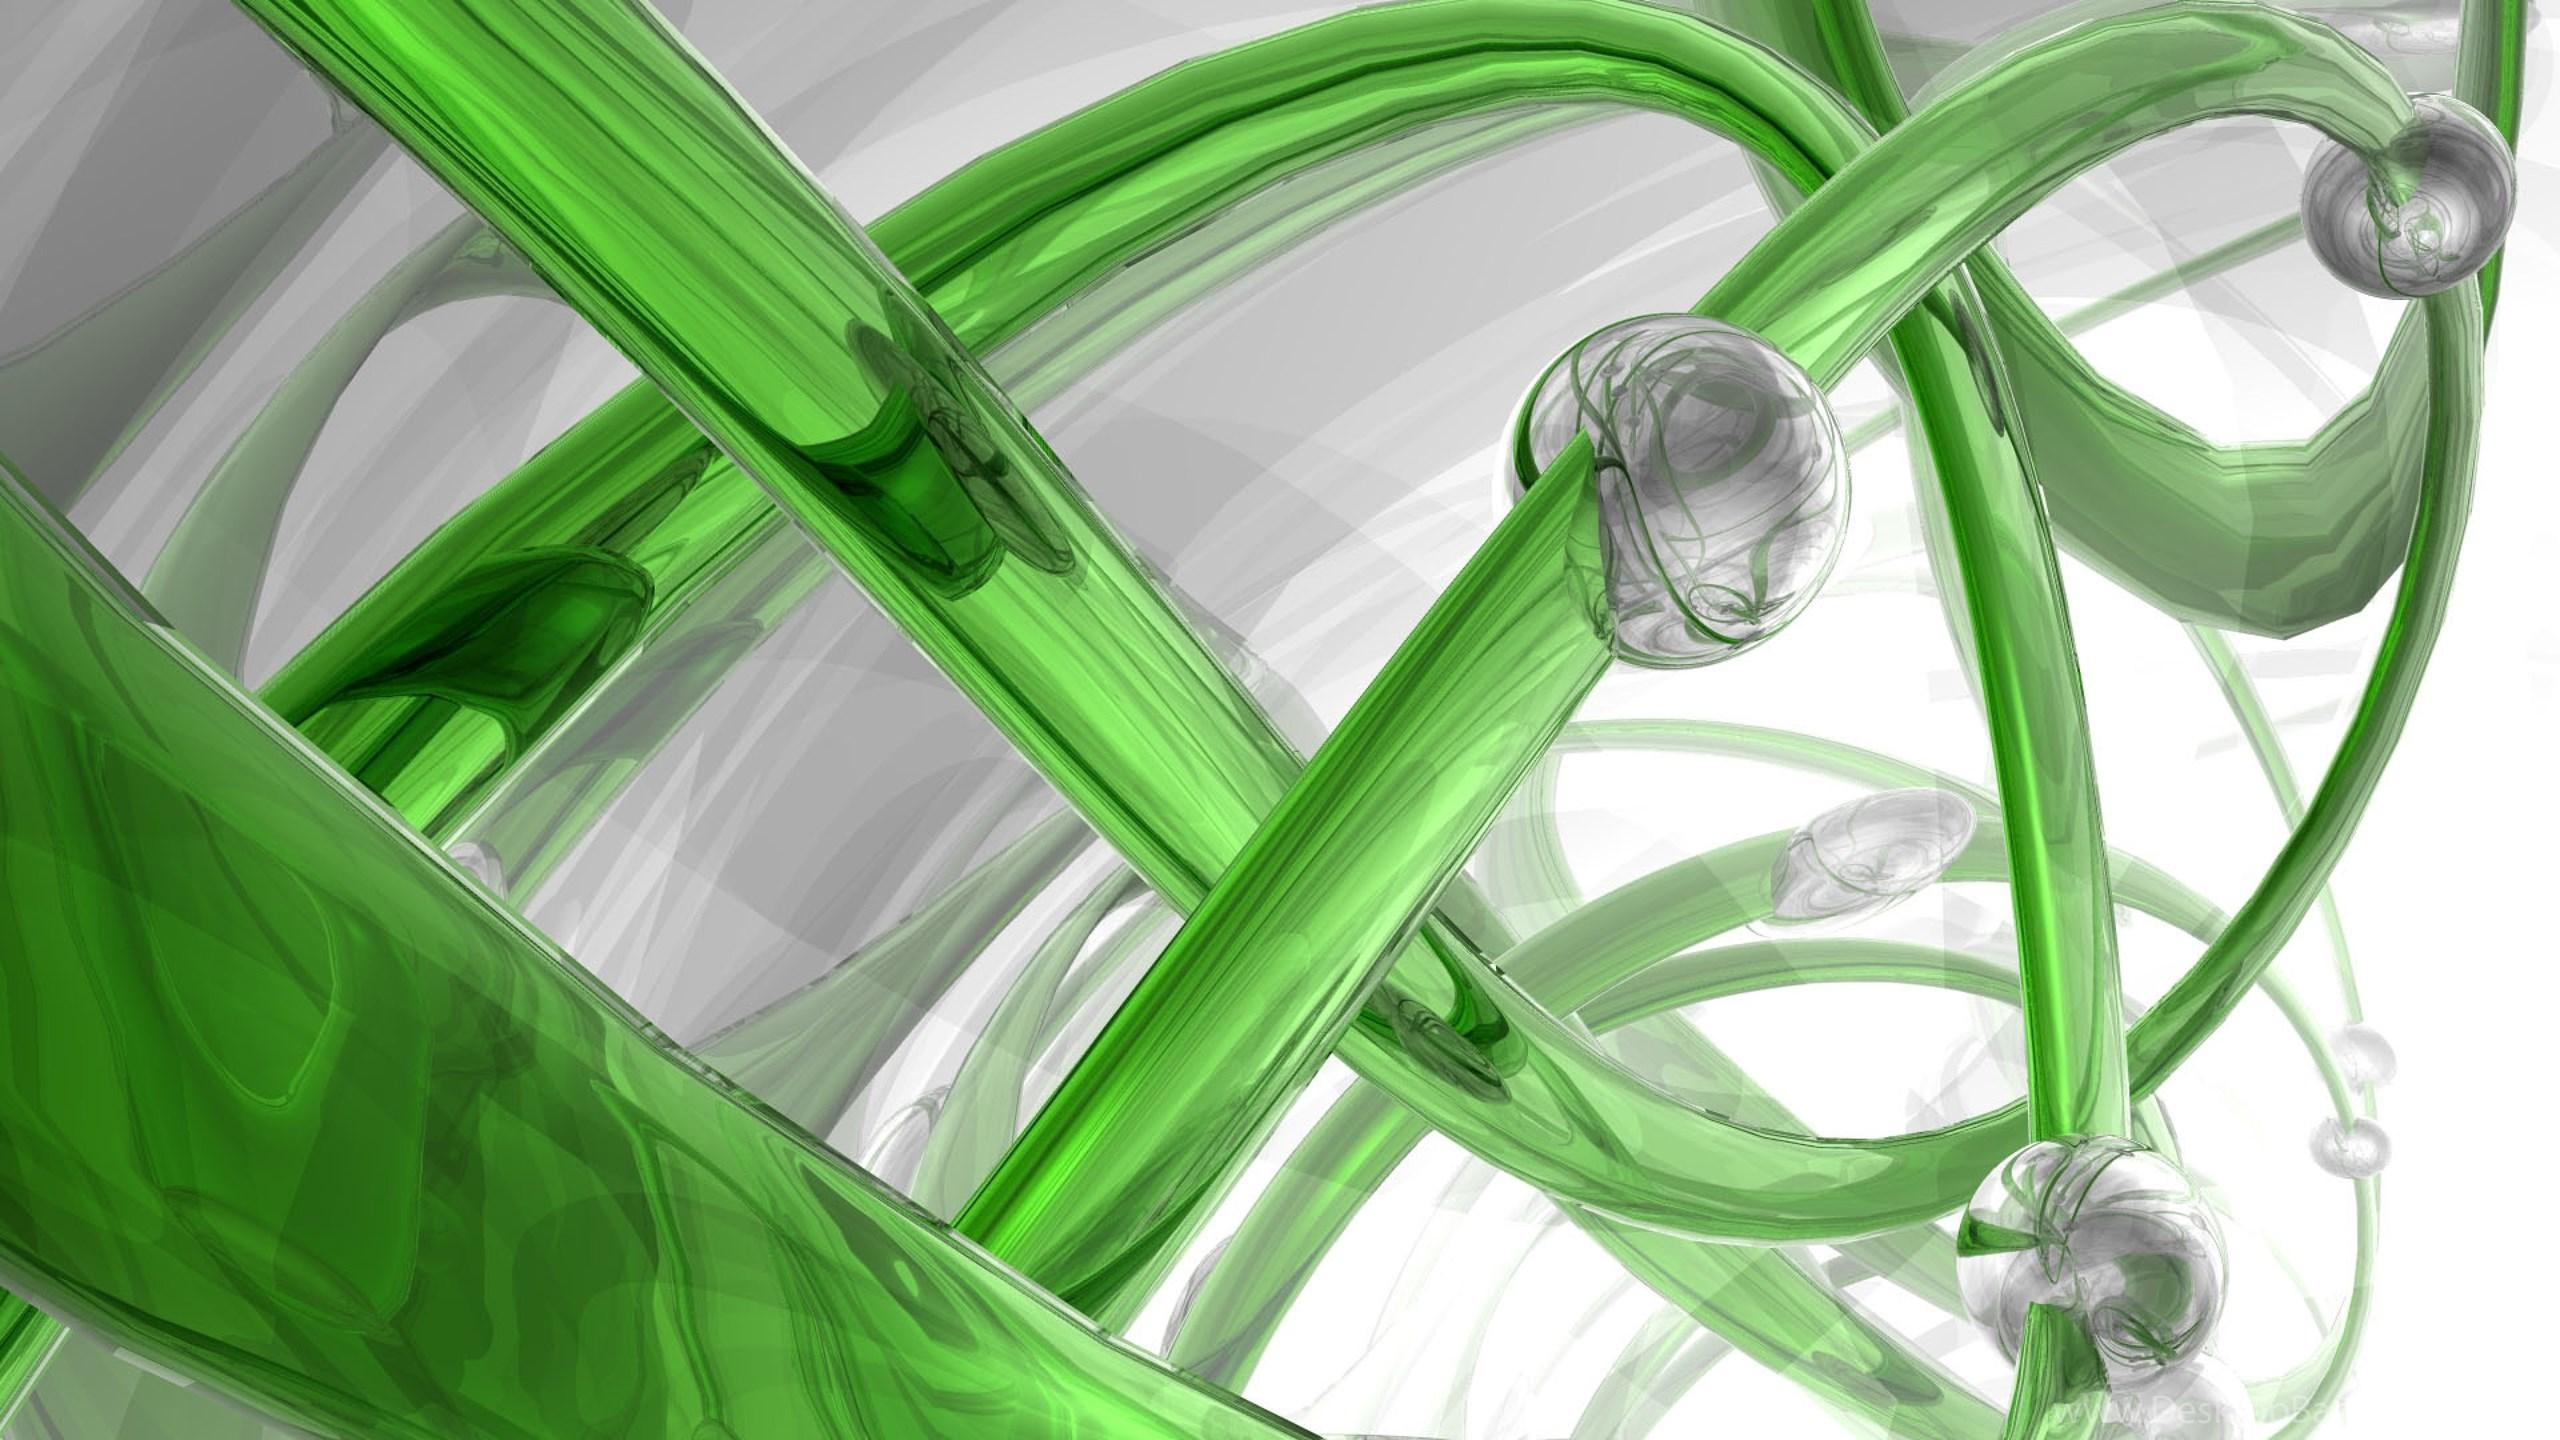 Download Wallpapers 3840x2160 3d, Spiral, Glass, Green ...